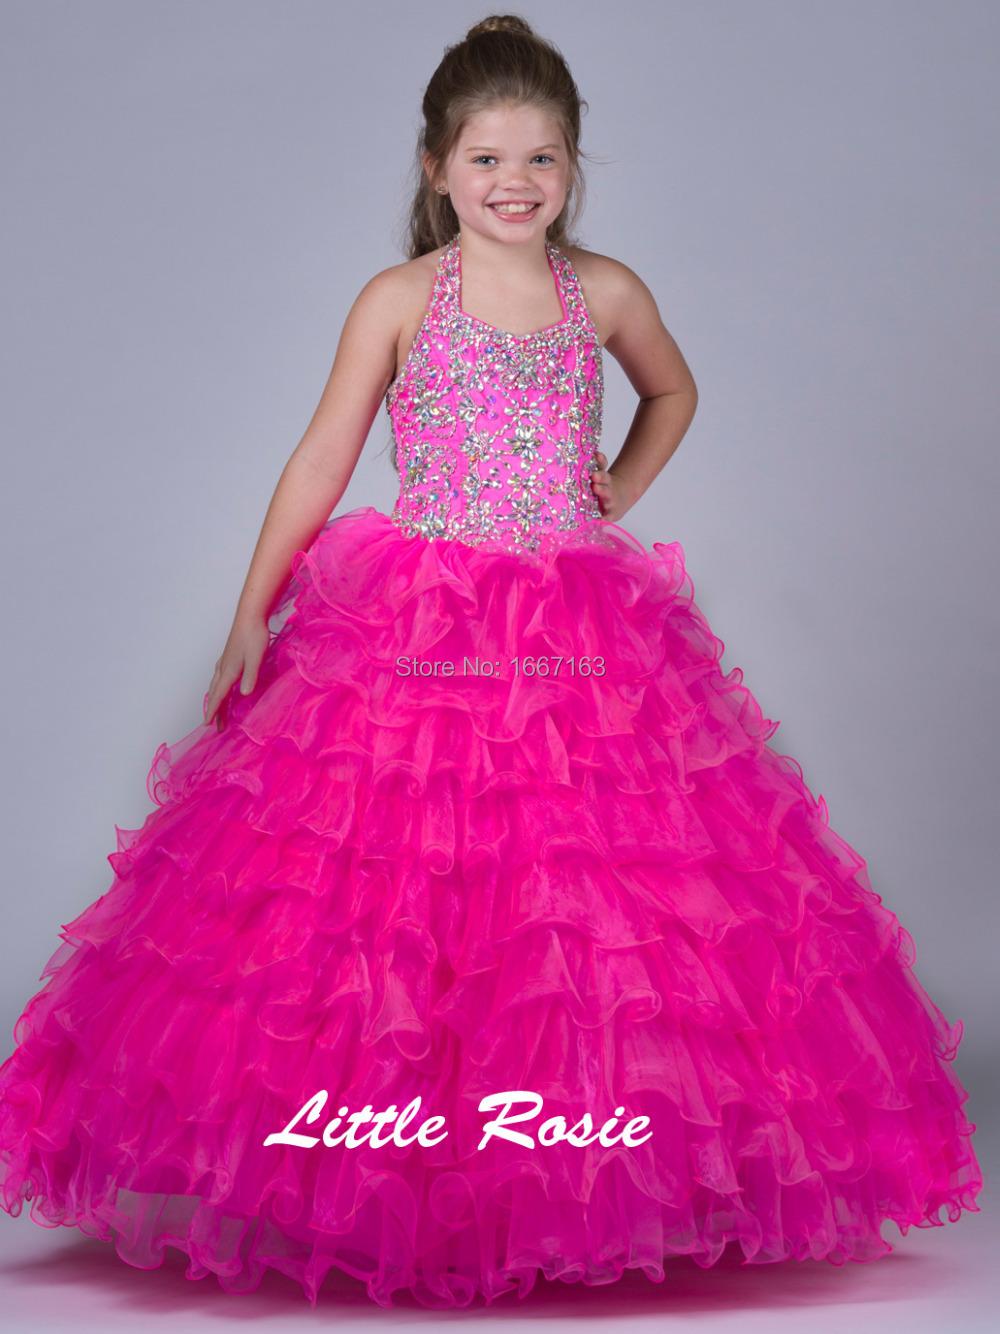 Girls Dresses Size 16